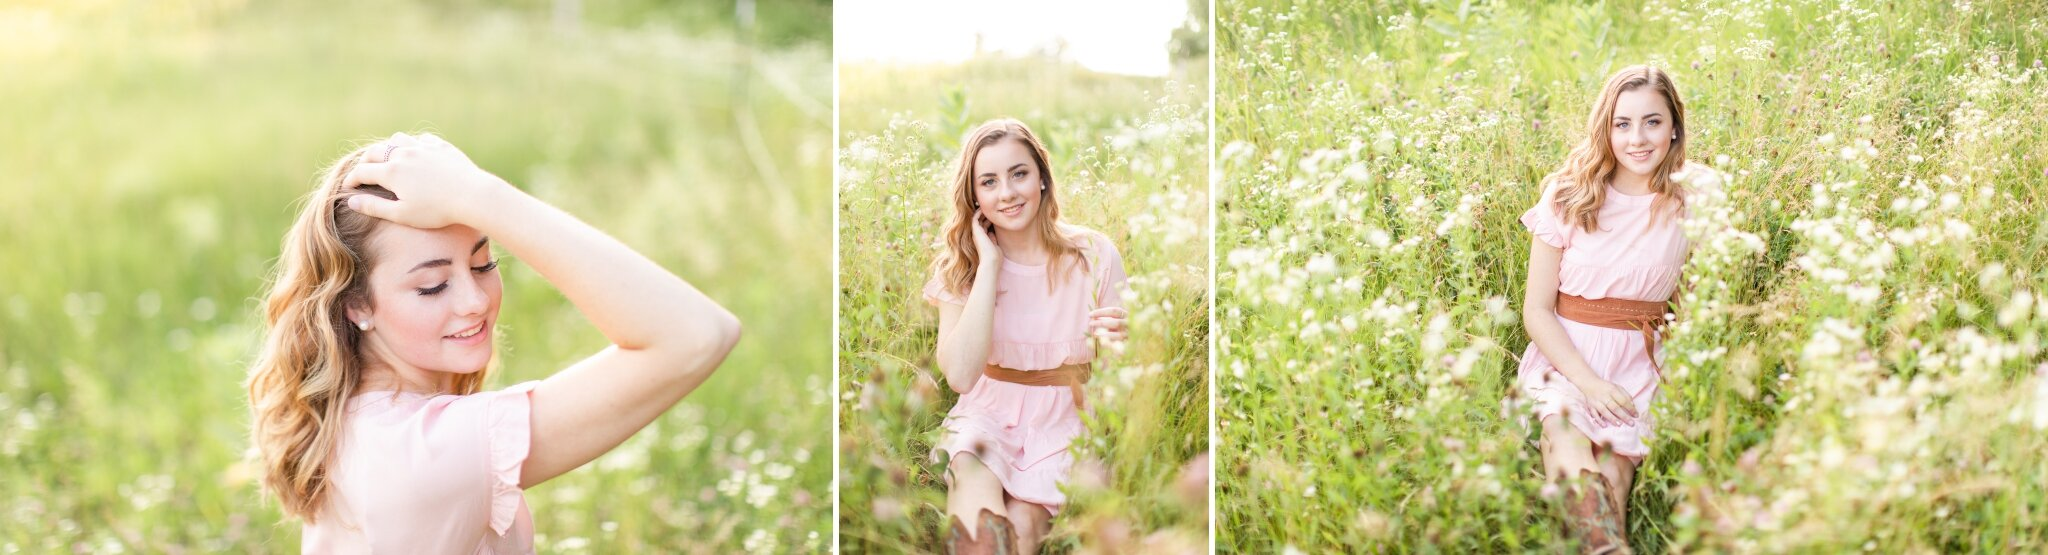 Appleton WI Senior Girl Poses